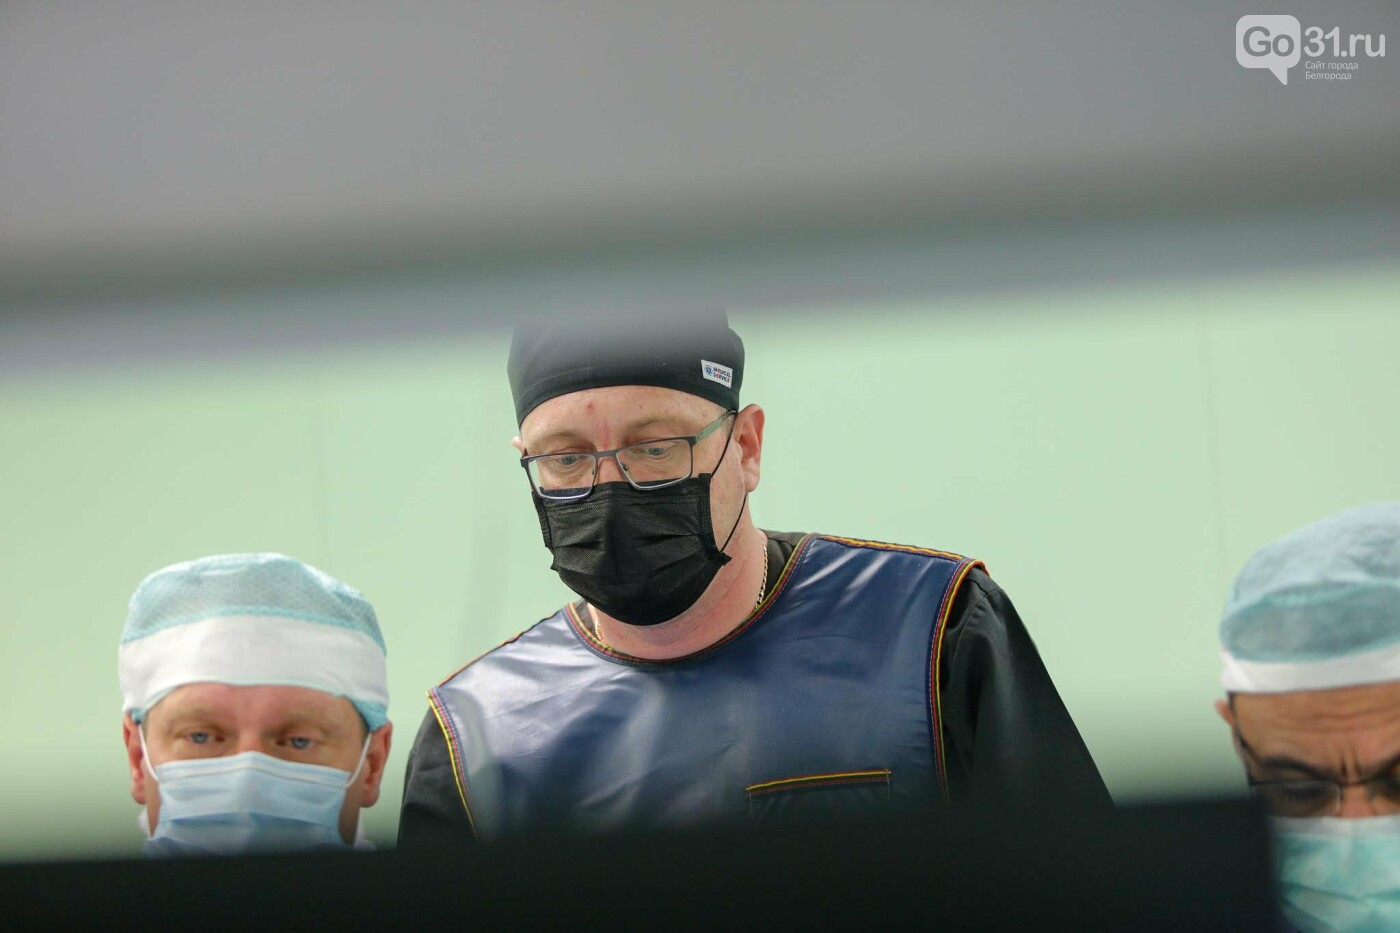 Как выглядит операция на сердце, фото-18